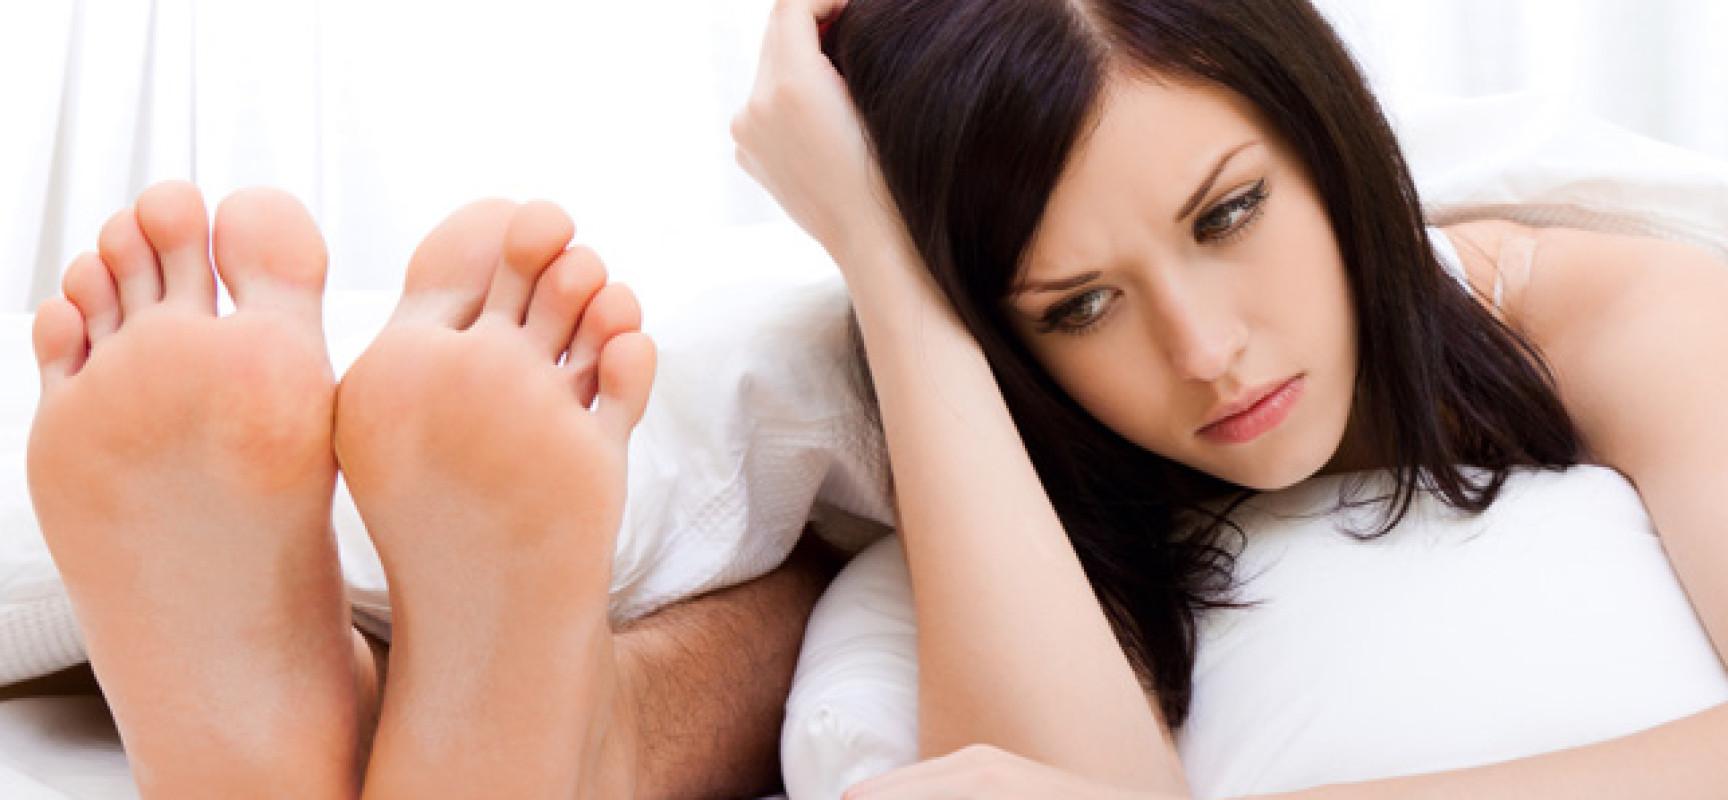 Przykre konsekwencje seksu